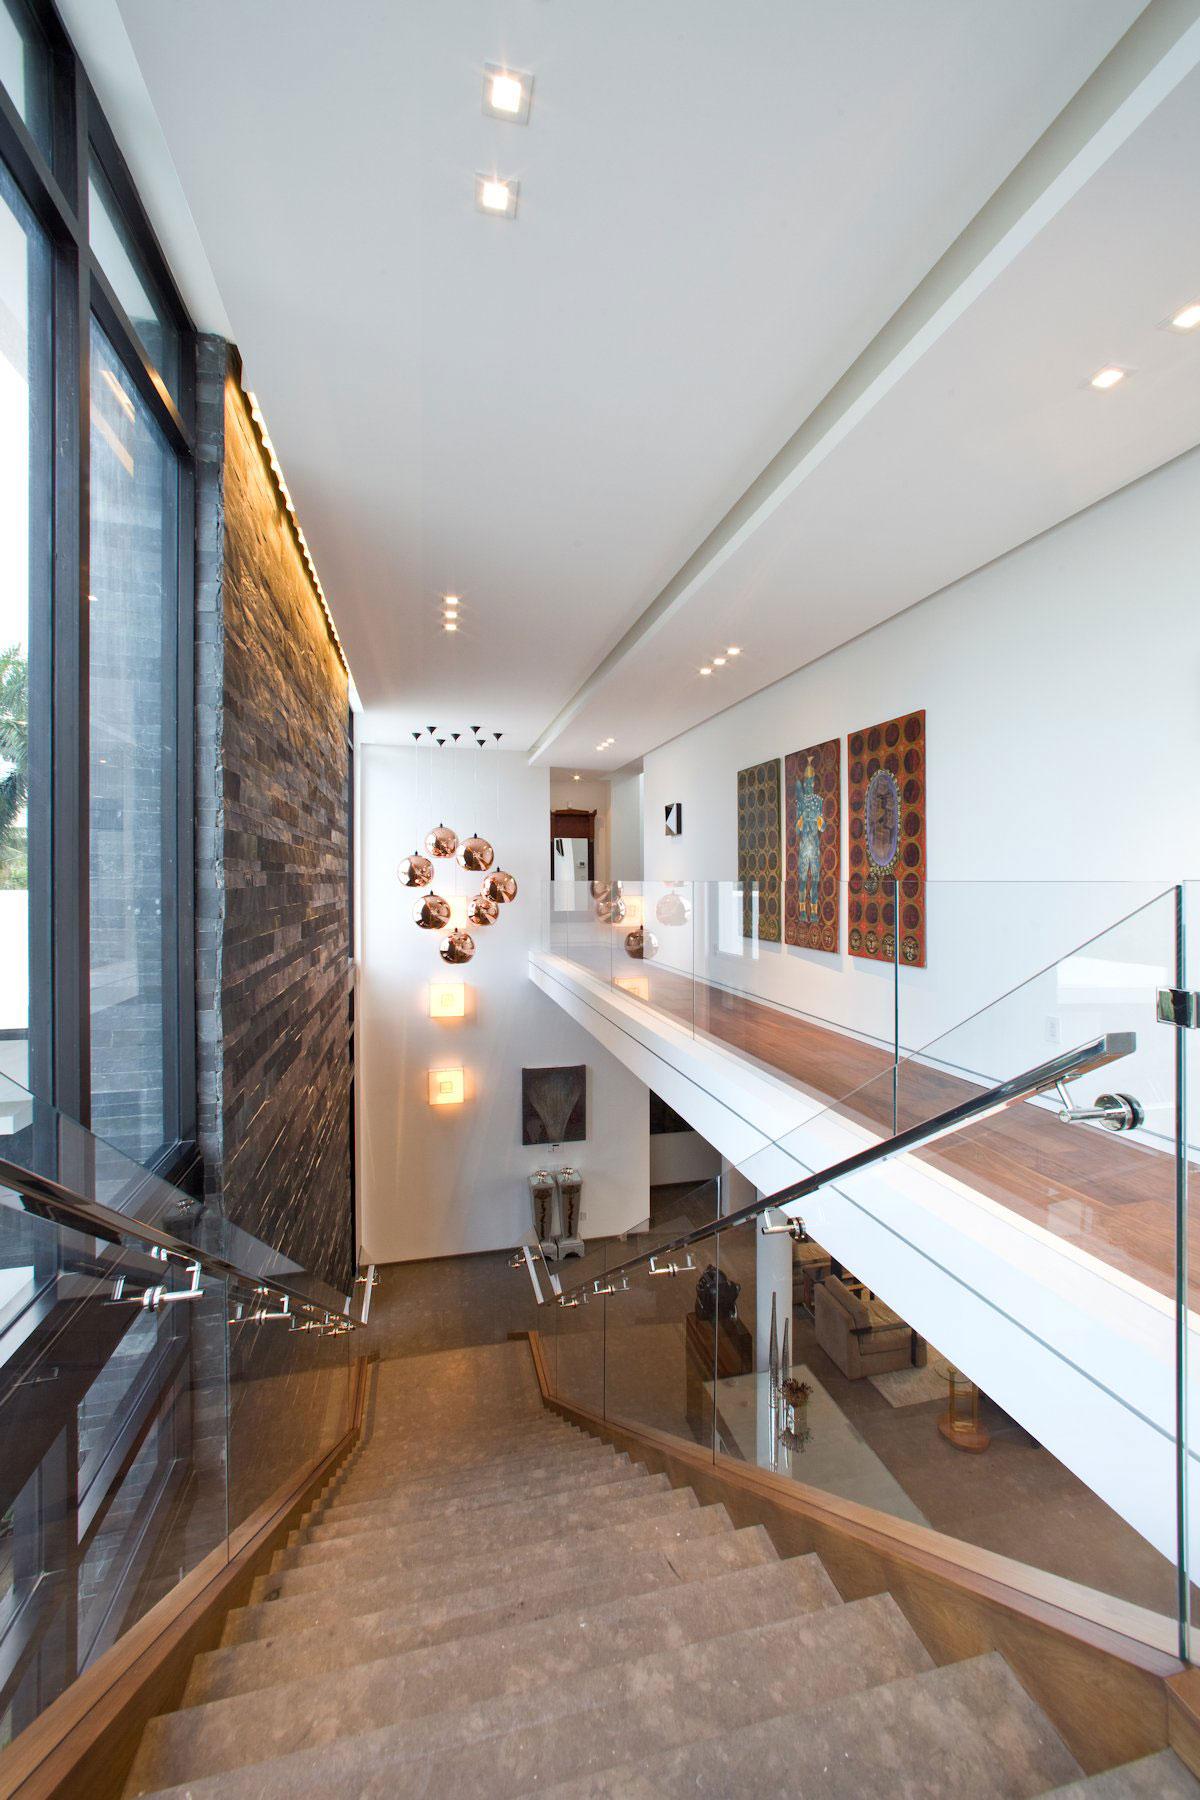 KZ Architecture, Franco Residence, муниципалитет Голден Бич, дома в Майами-Дейд, особняки во Флориде, роскошные дома в США, белый фасад частного дома